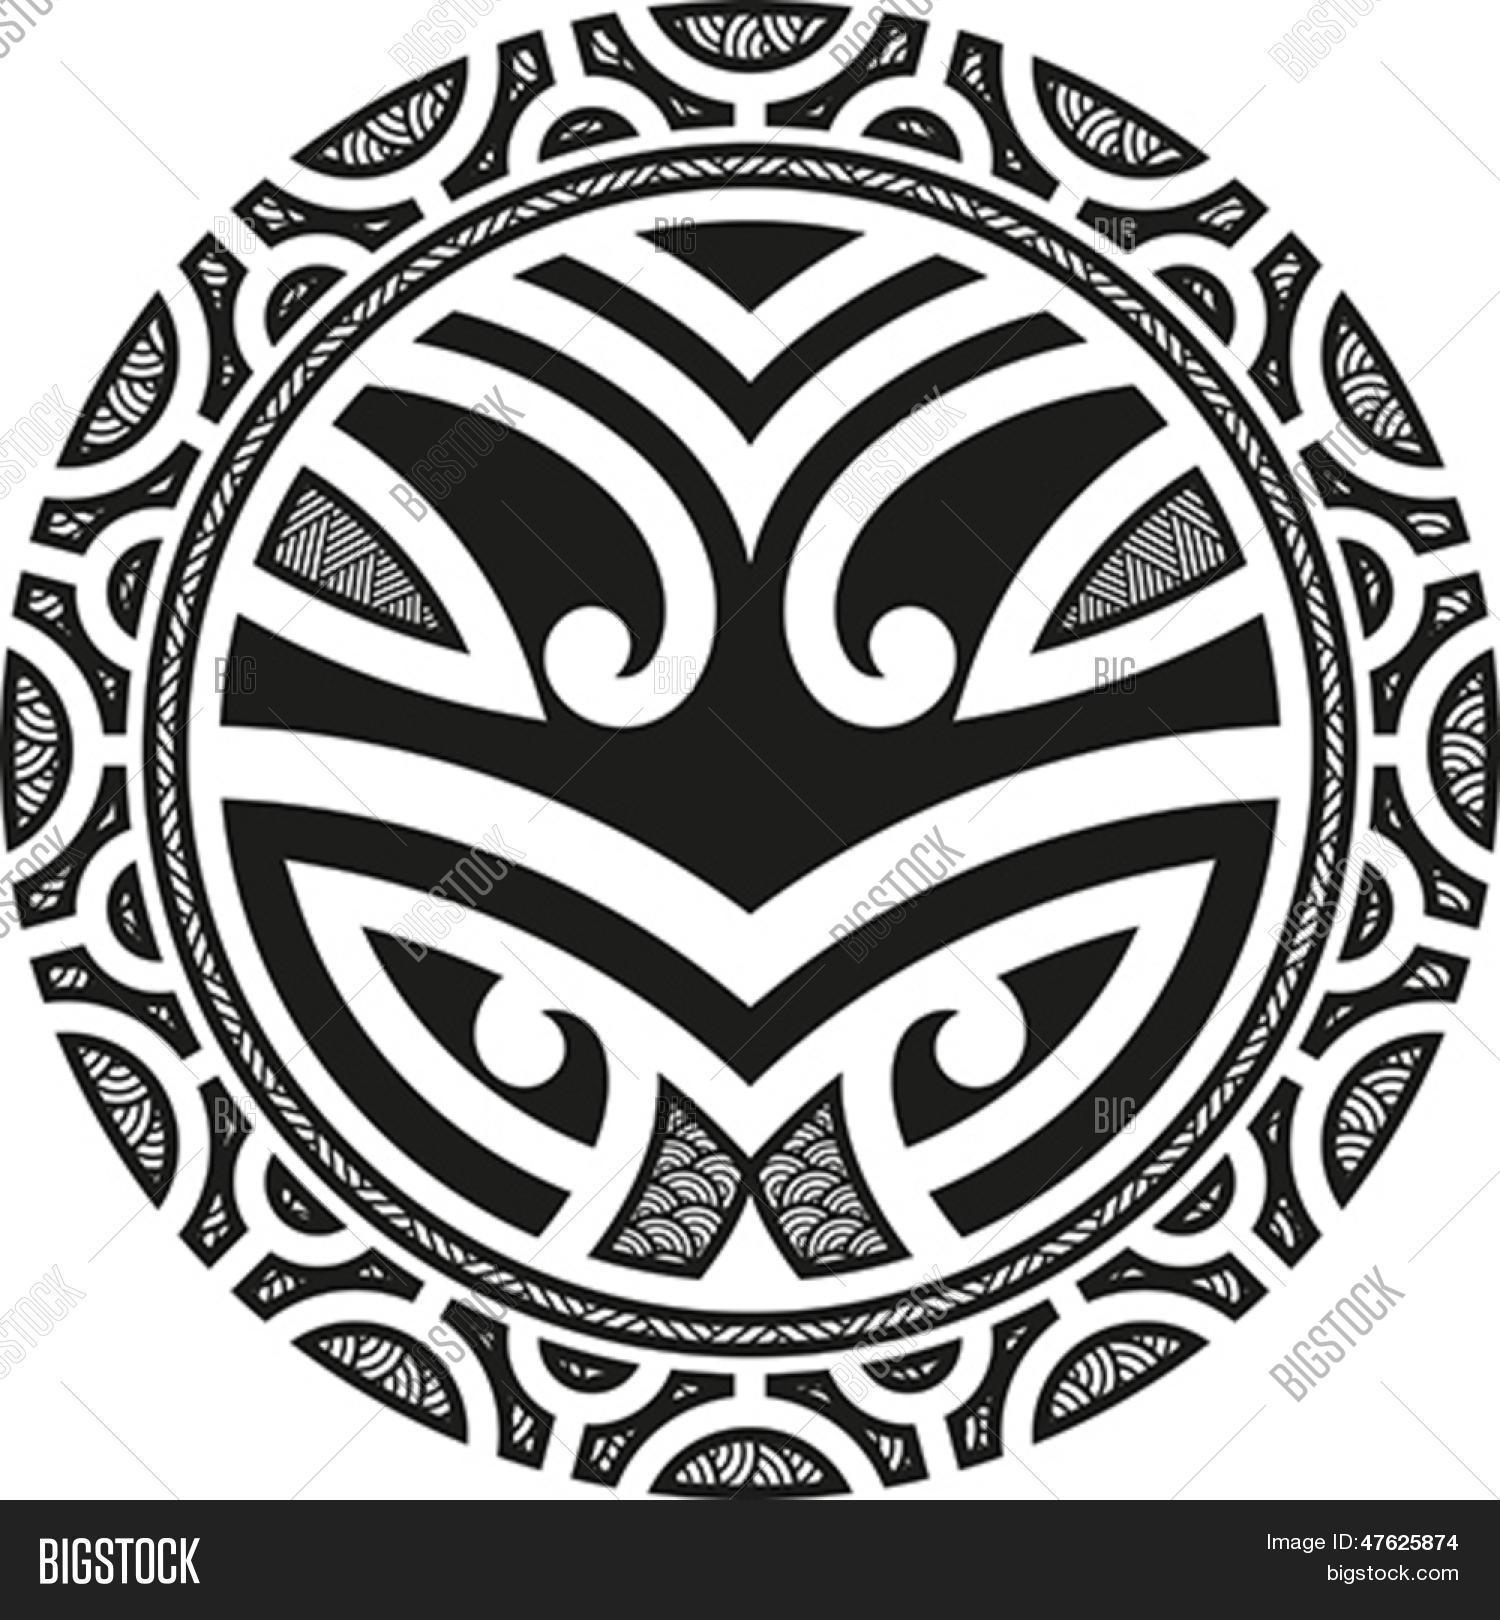 traditional maori taniwha tattoo vector photo bigstock. Black Bedroom Furniture Sets. Home Design Ideas